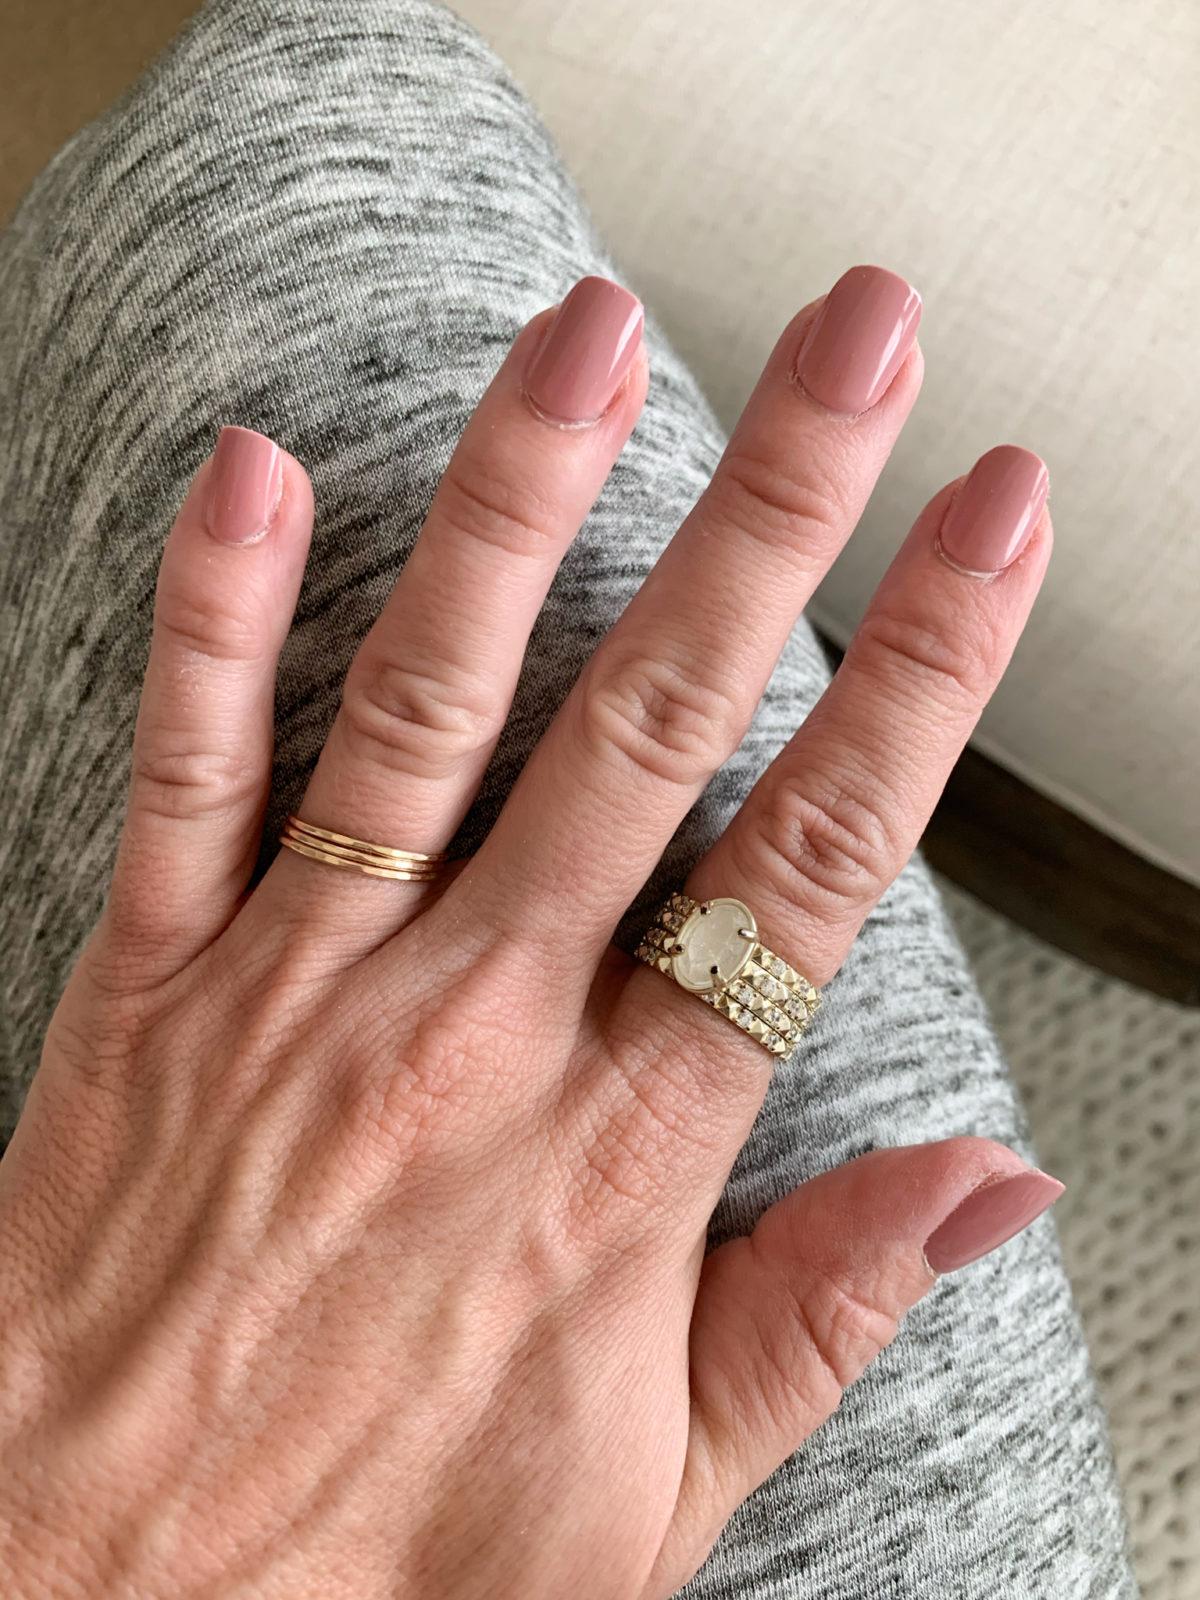 Amazon Fashion Finds, Press On Nails, Gorjana Ring, Kendra Scott Ring